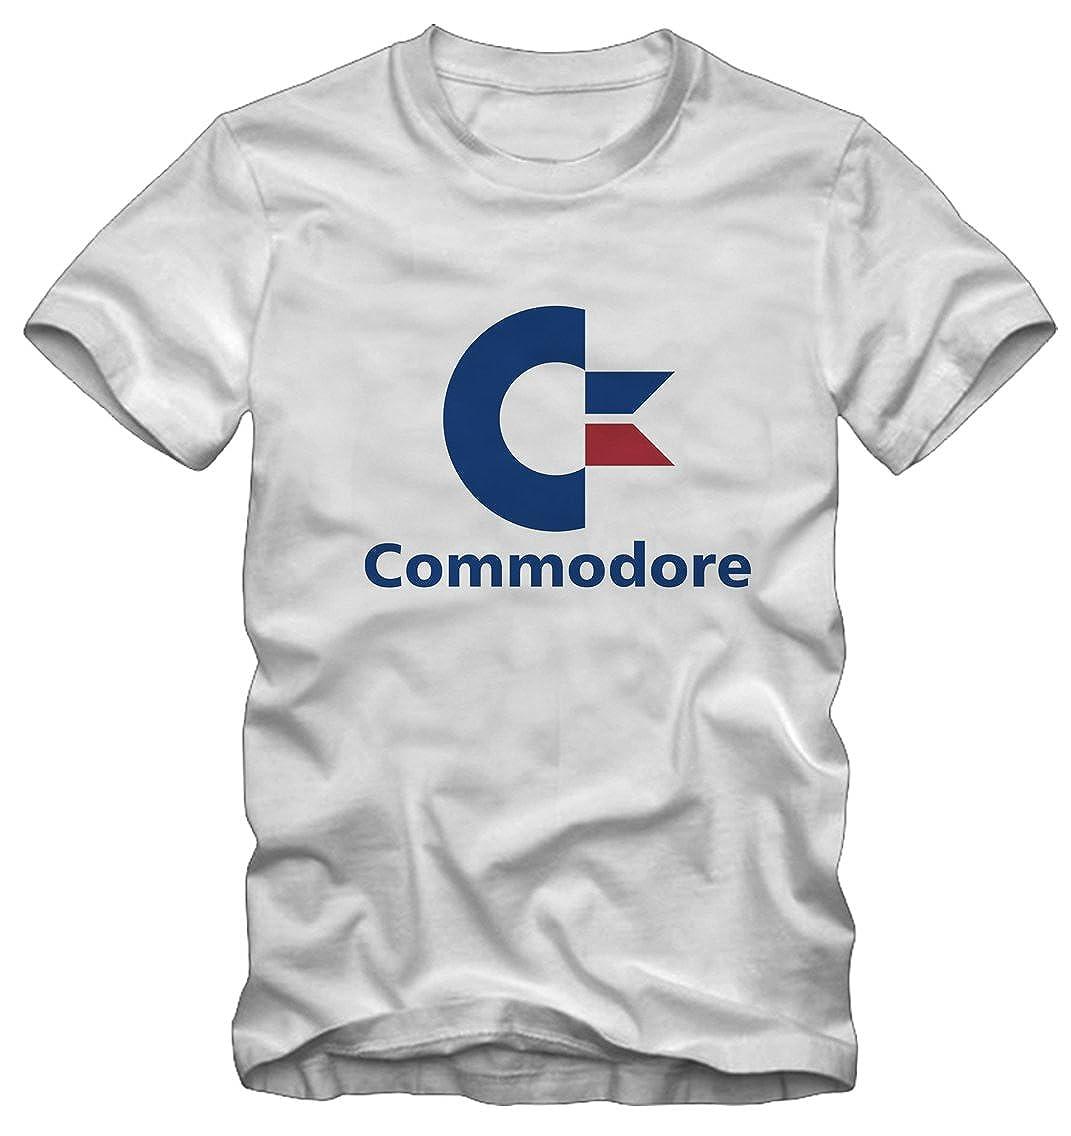 Bisura T-Shirt Commodore 64 Vintage